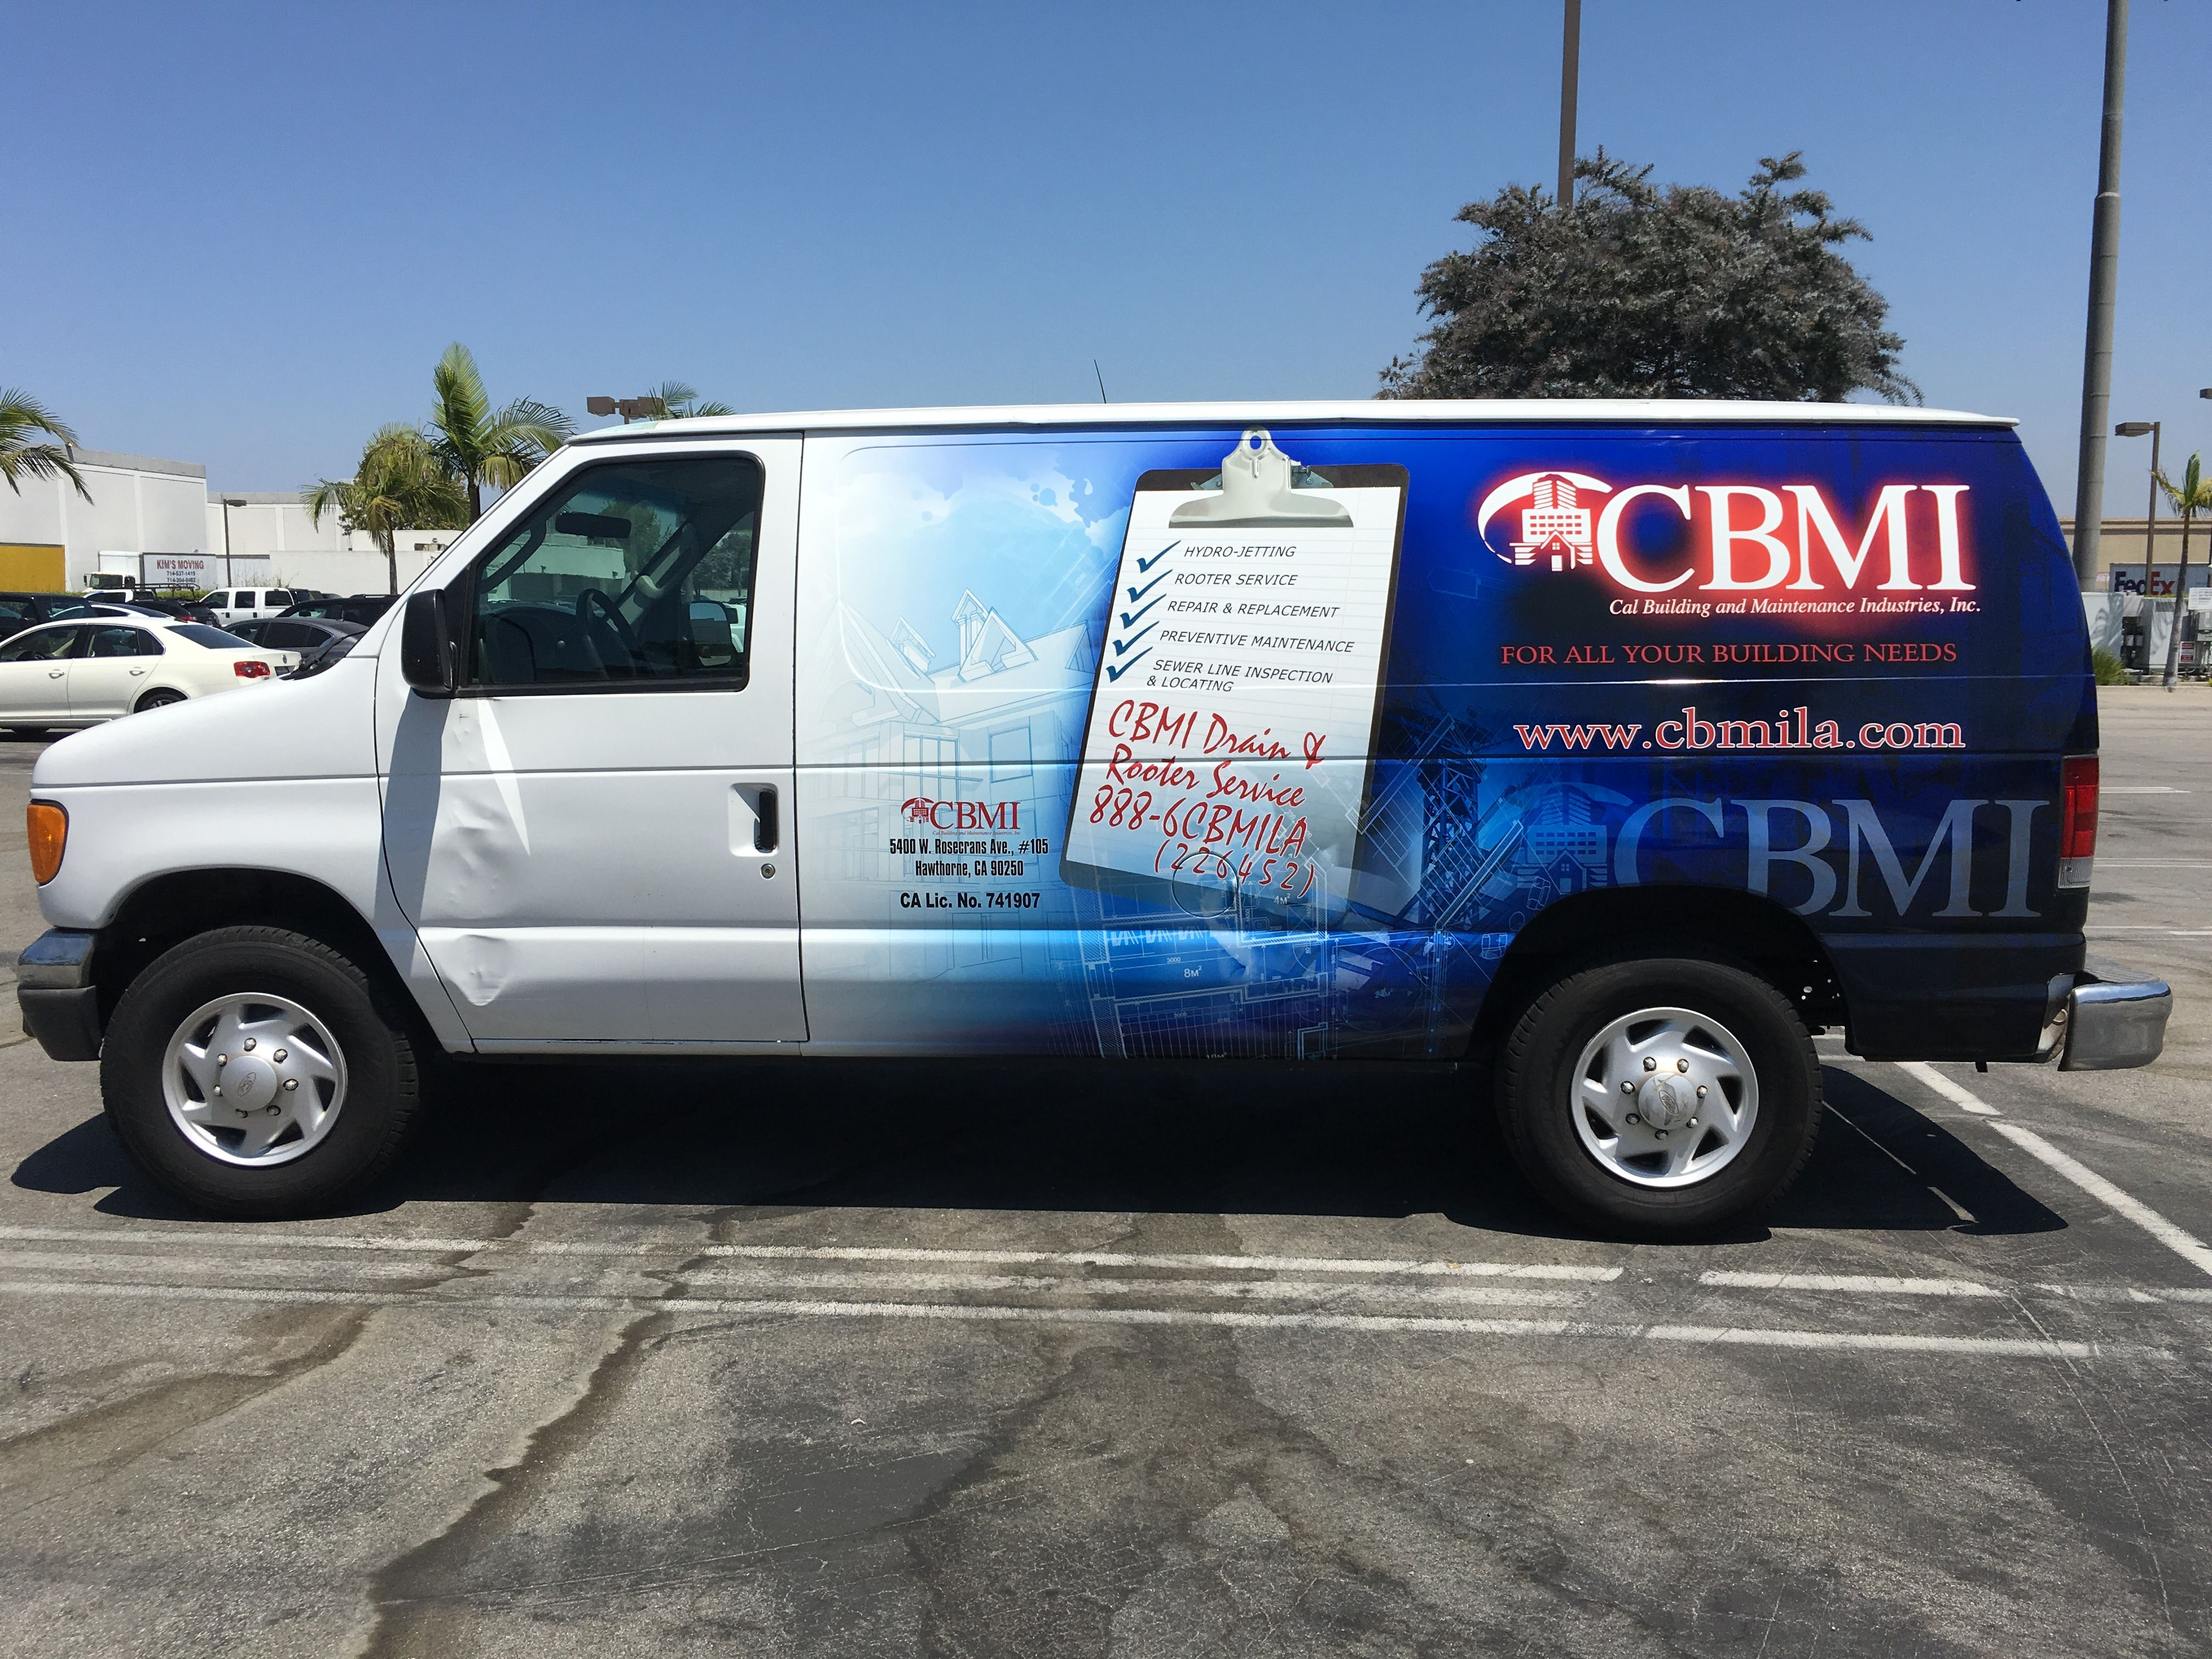 Mobile advertising skinzwrap van for cbmi mobile